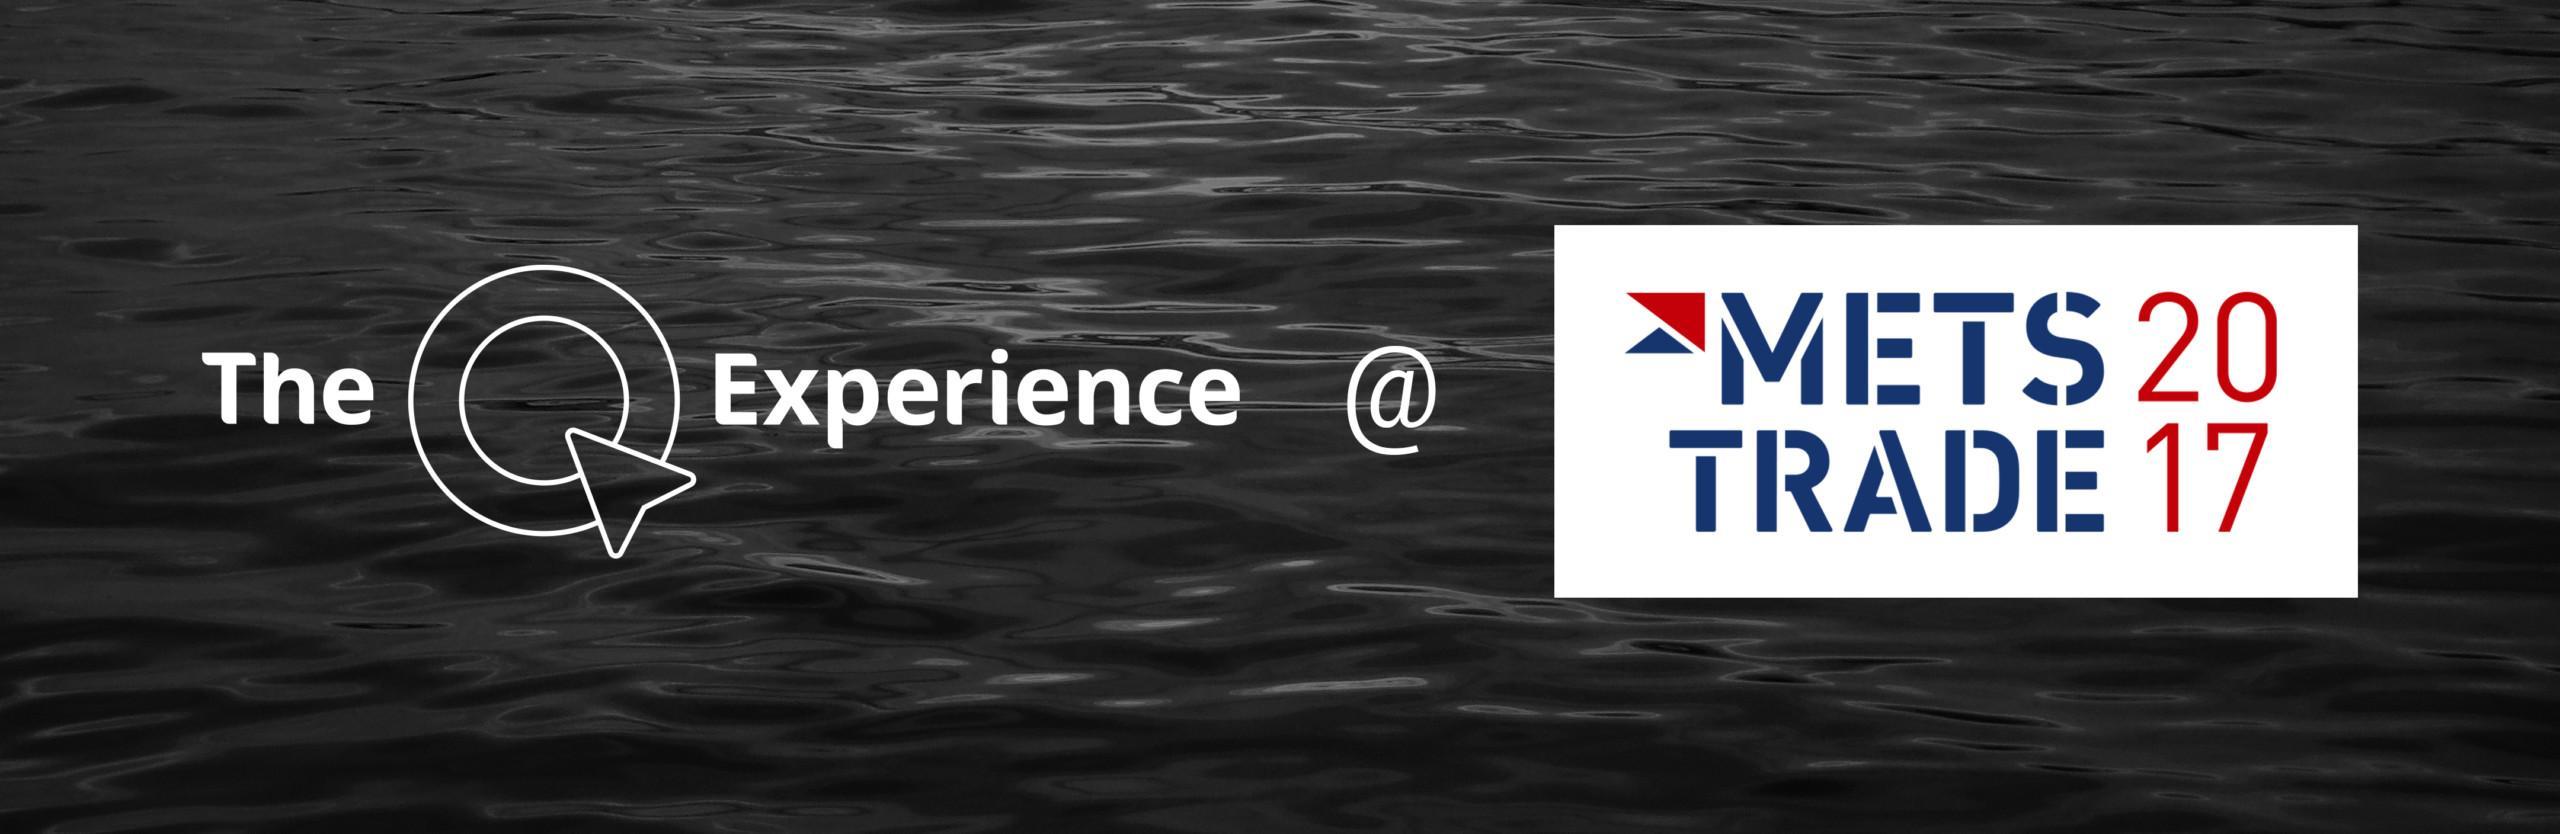 Q Experience at METSTRADE 2017